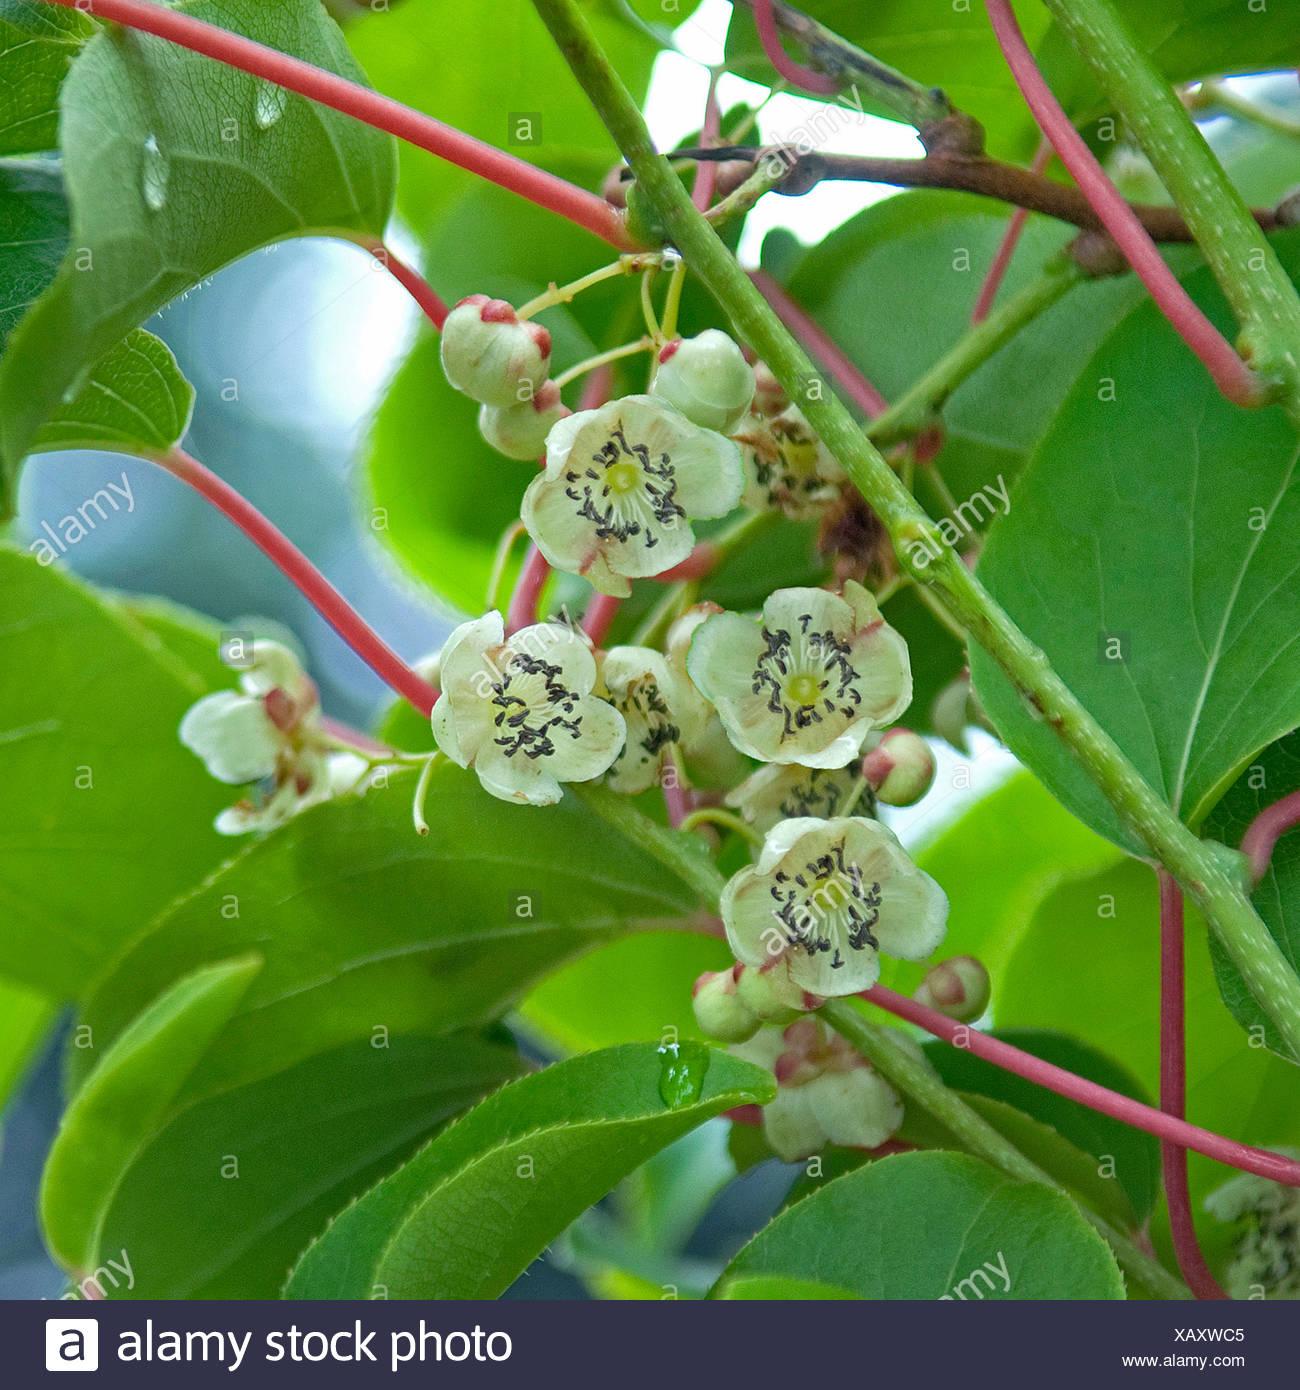 kiwi (Actinidia arguta 'Milano'), male flowers, Germany Stock Photo